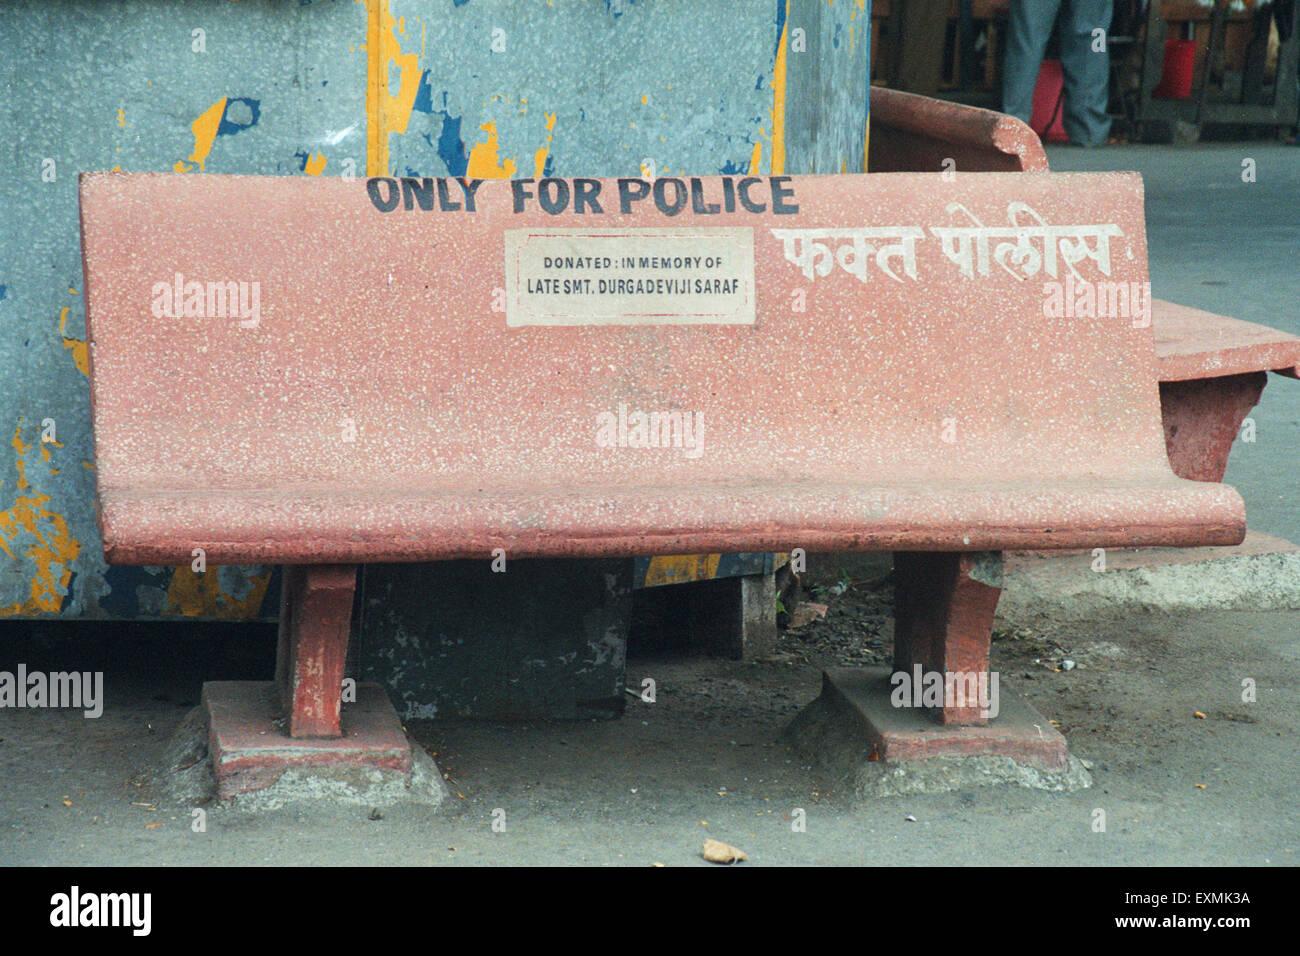 Only for police written on bench on street Bombay Mumbai Maharashtra India - Stock Image